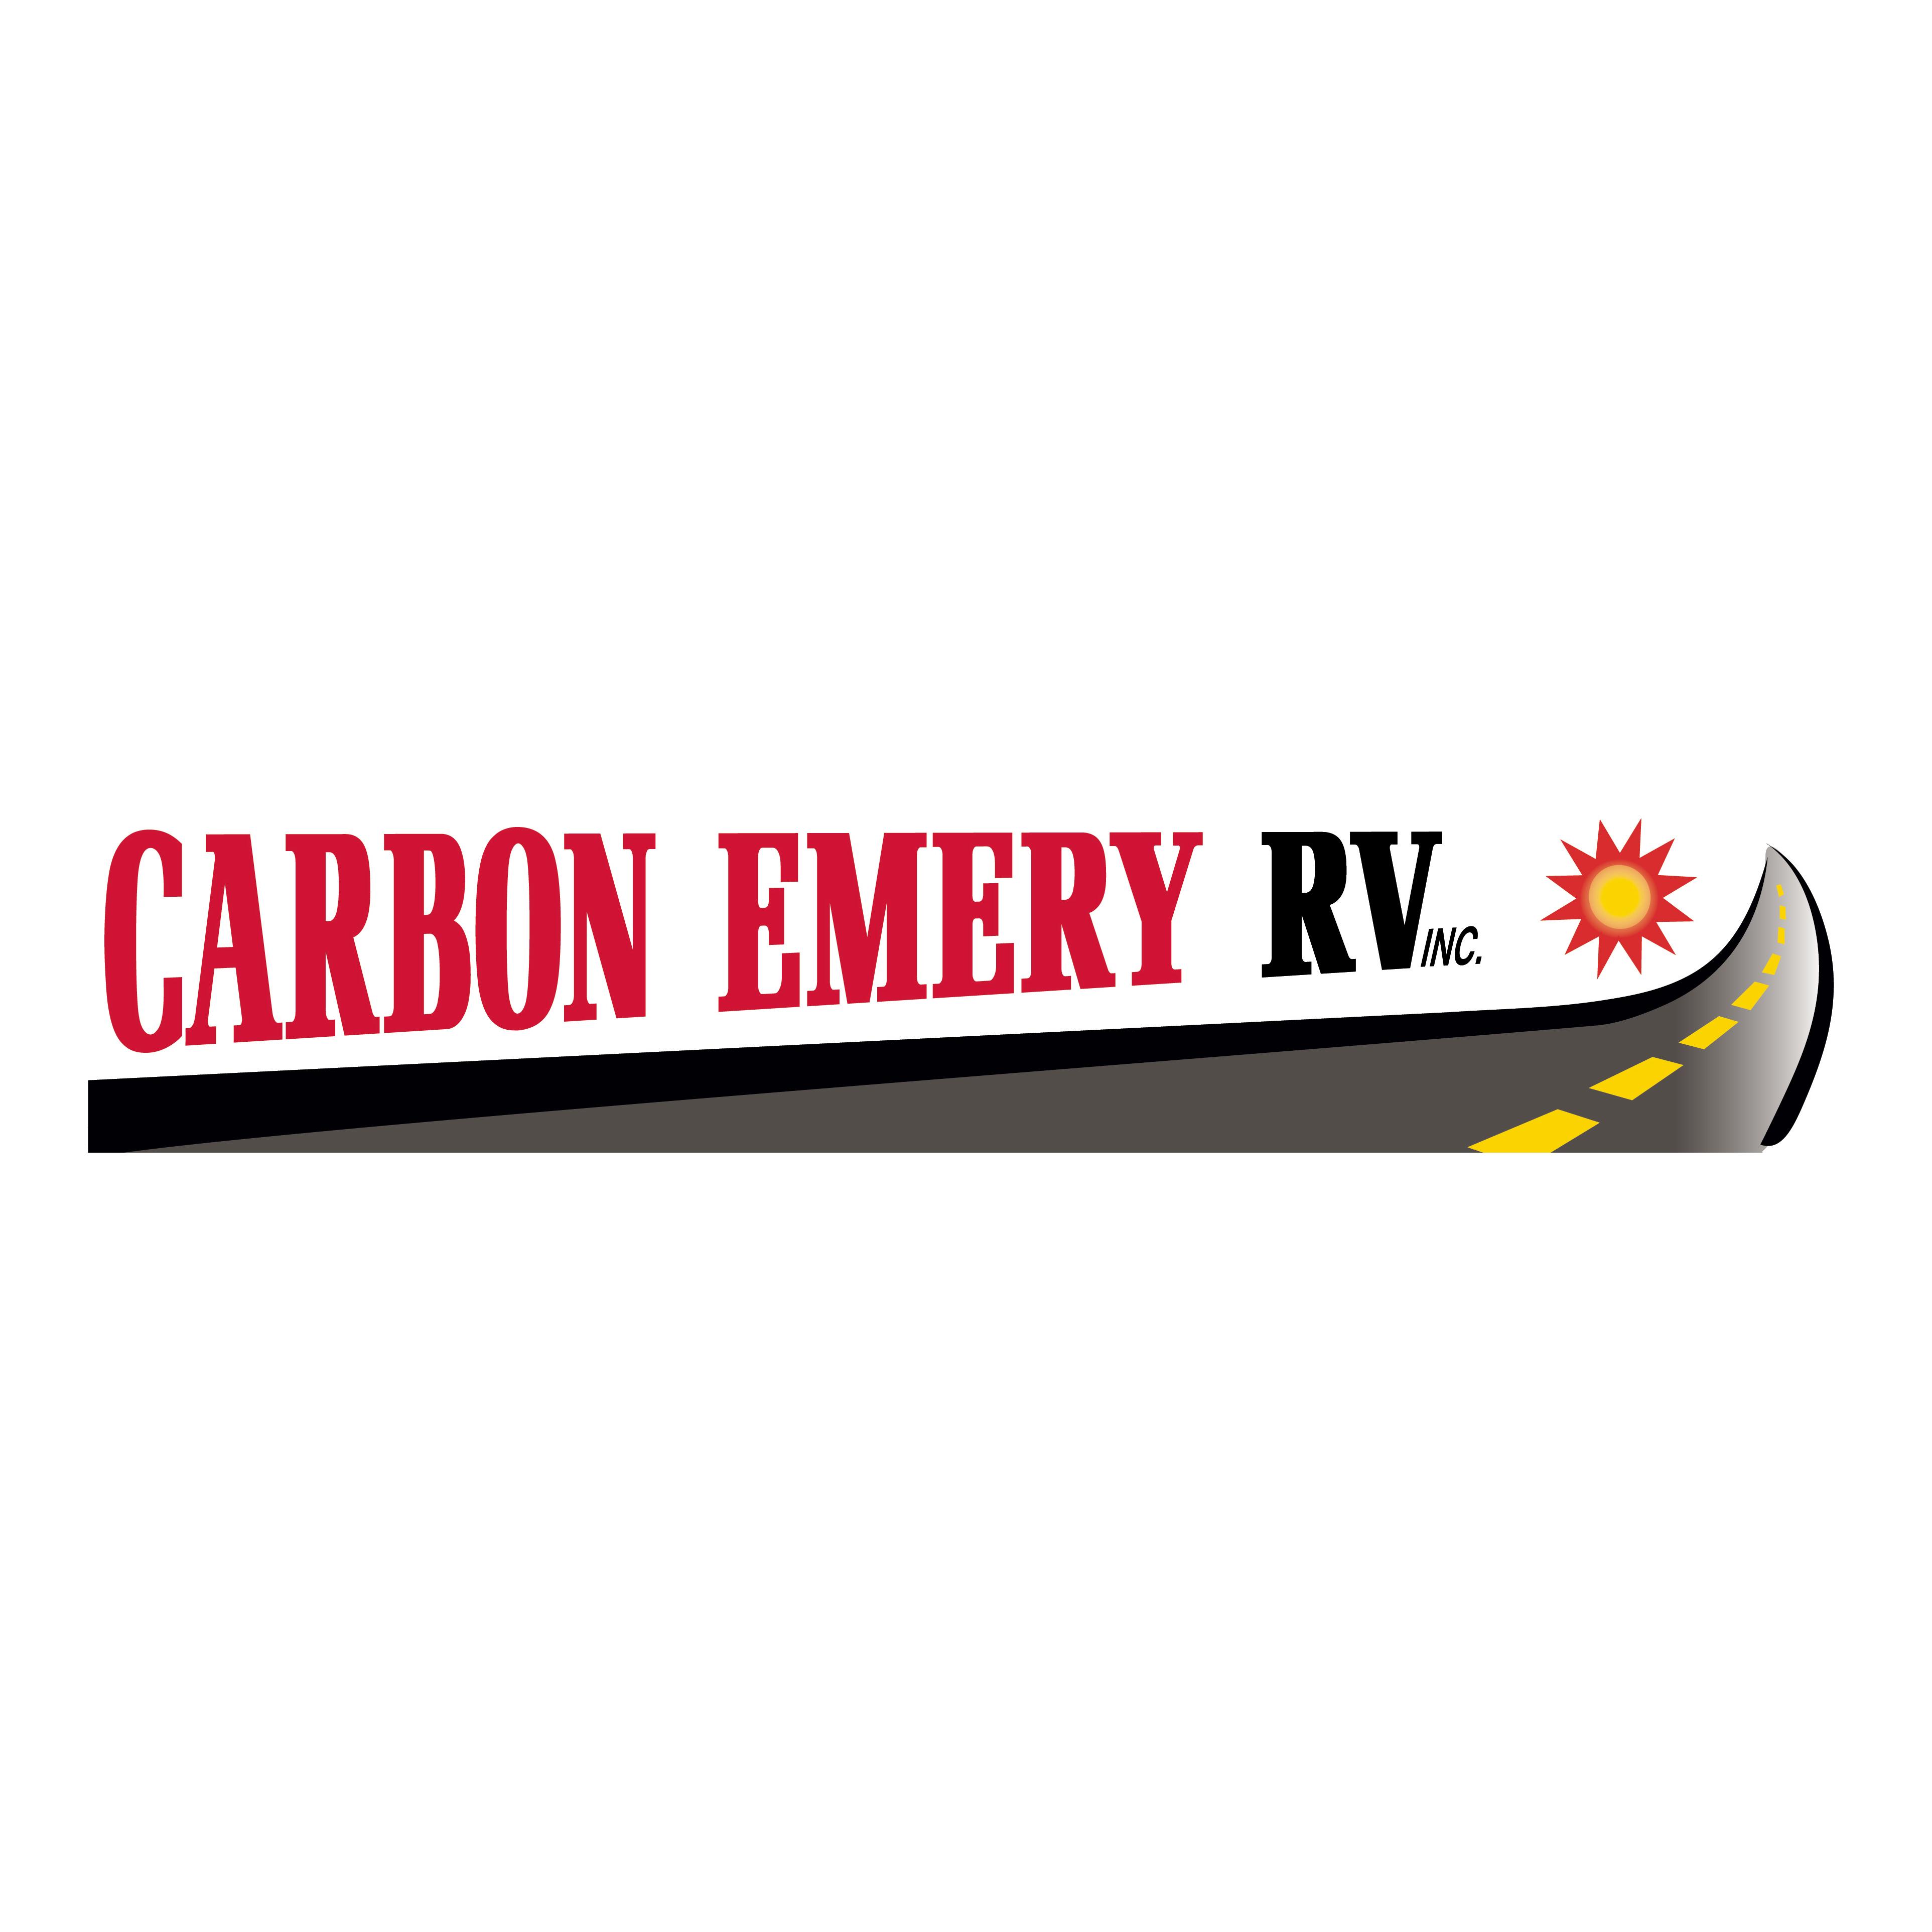 Carbon Emery Rv